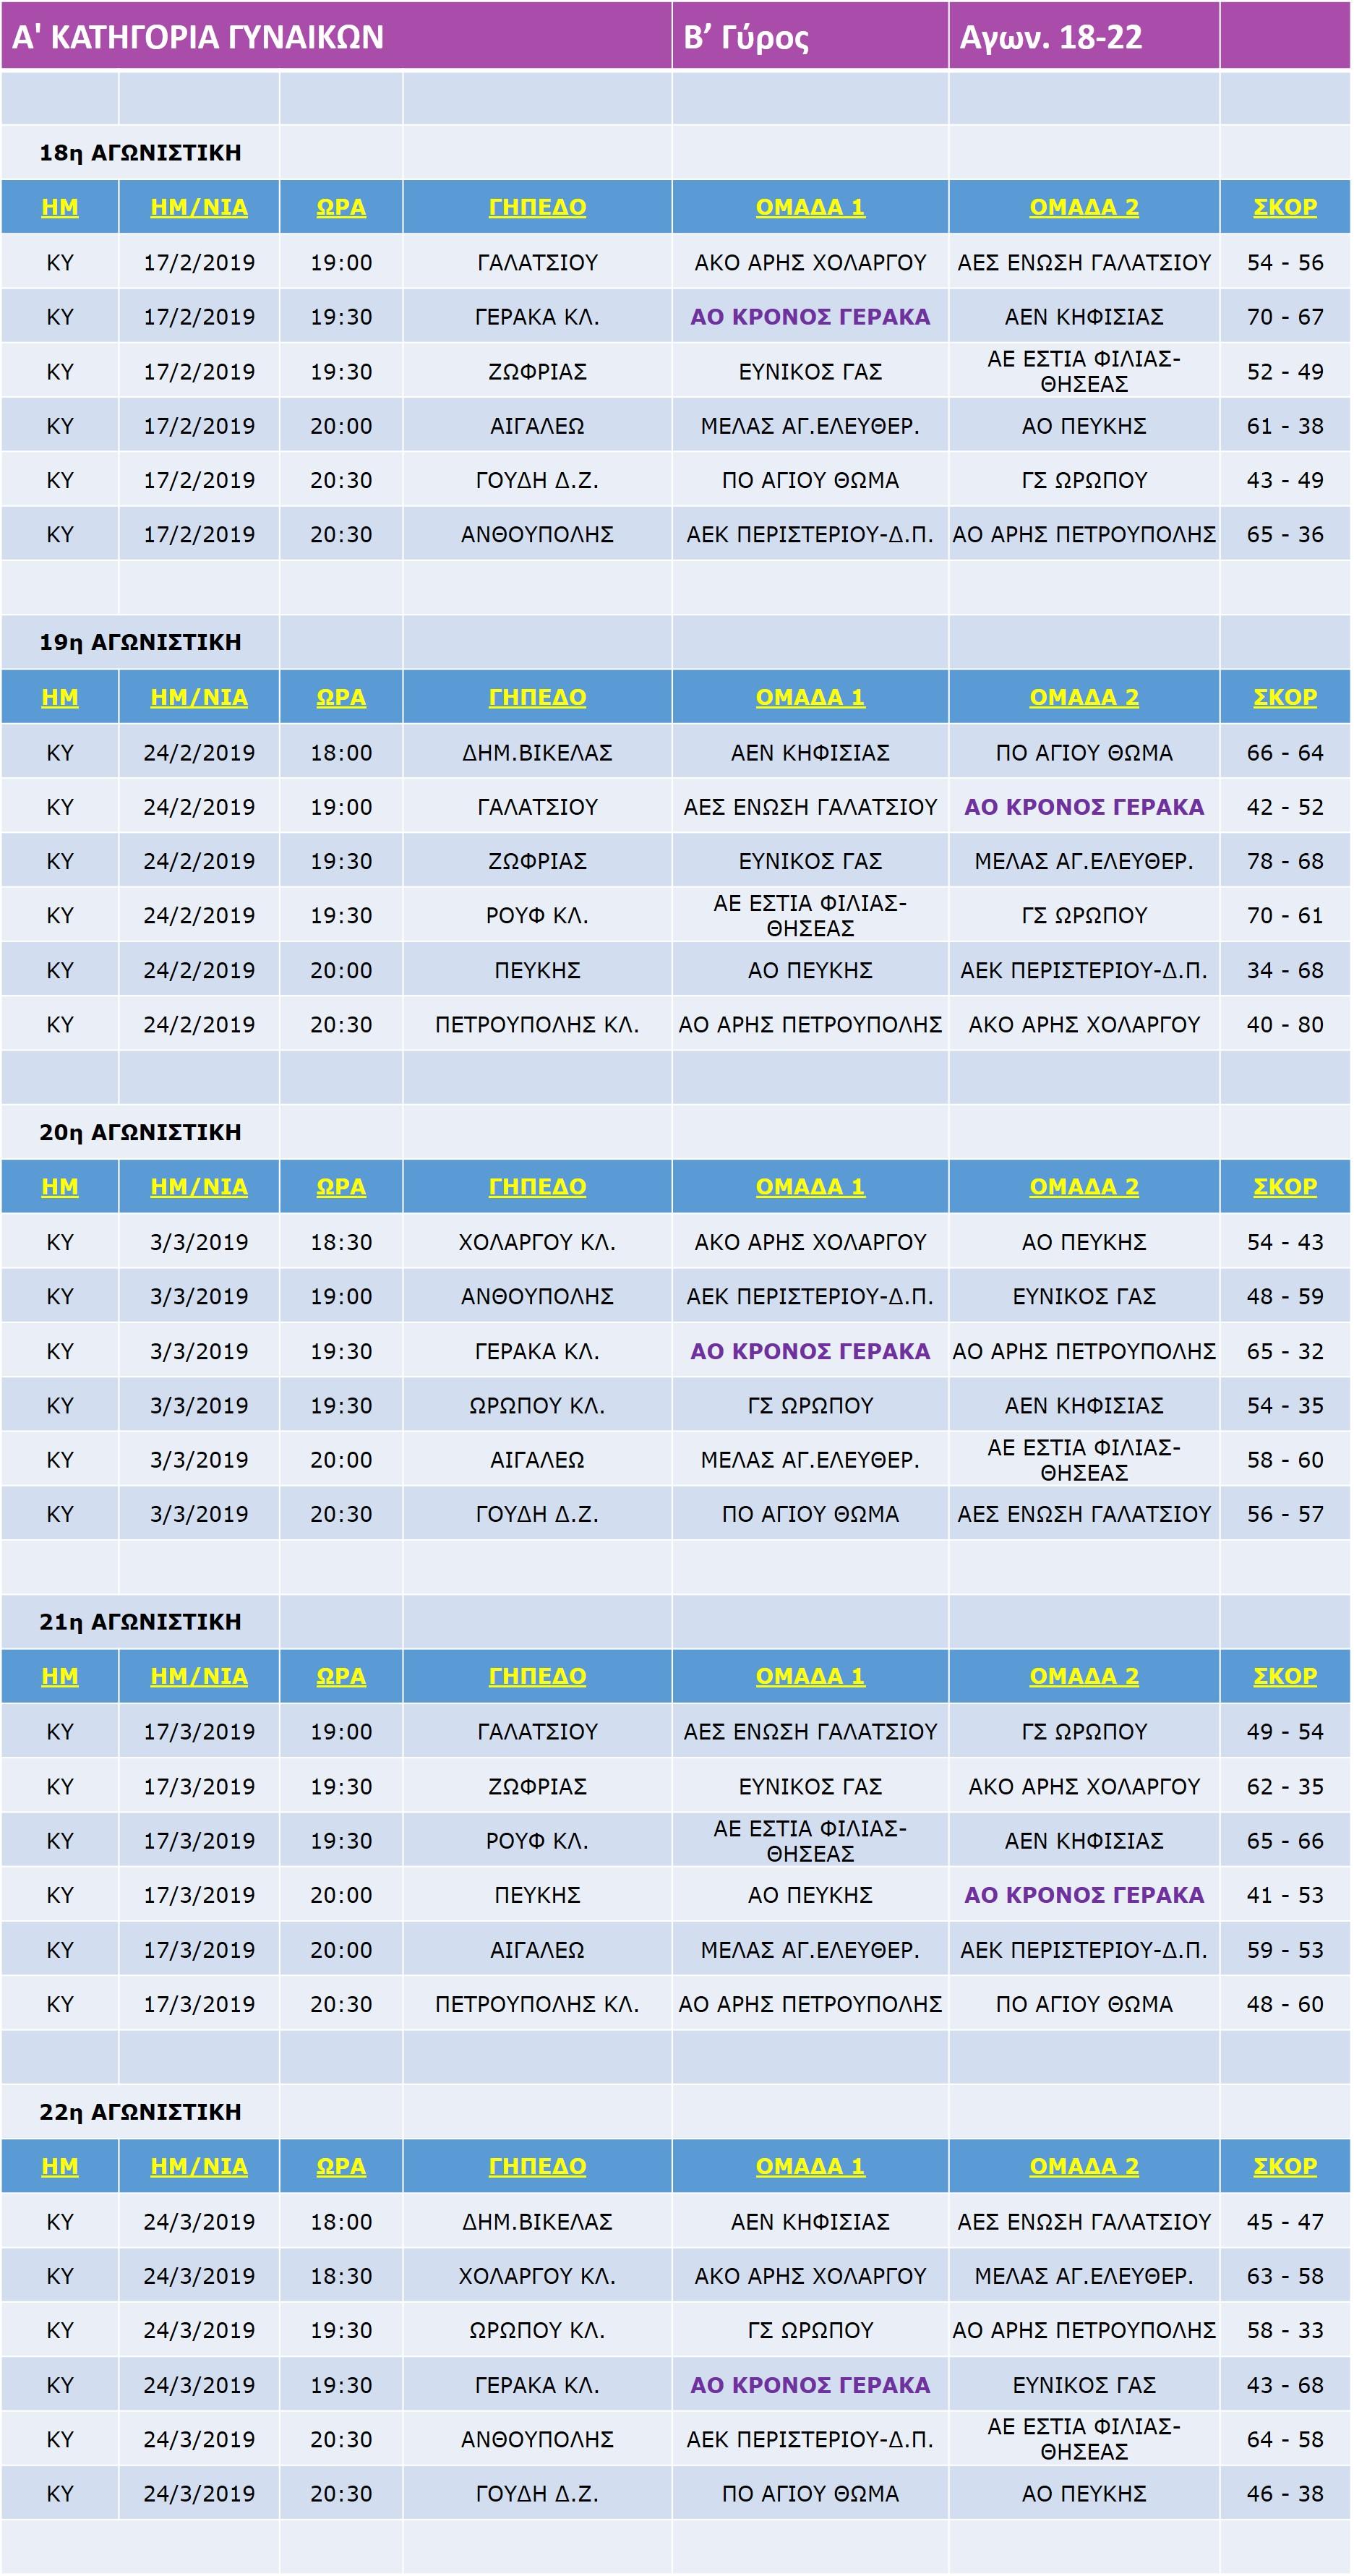 Gynaikes_Match_18-22-22